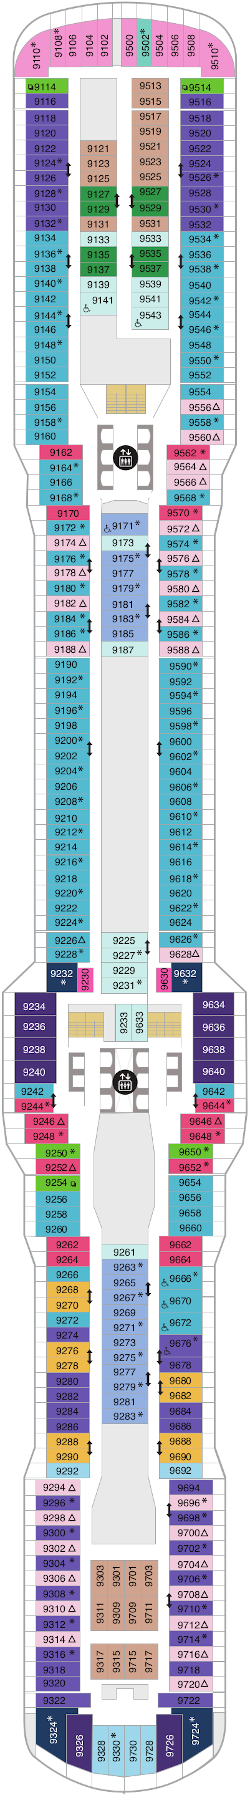 Spectrum Of The Seas Deck Nine Deck Plan